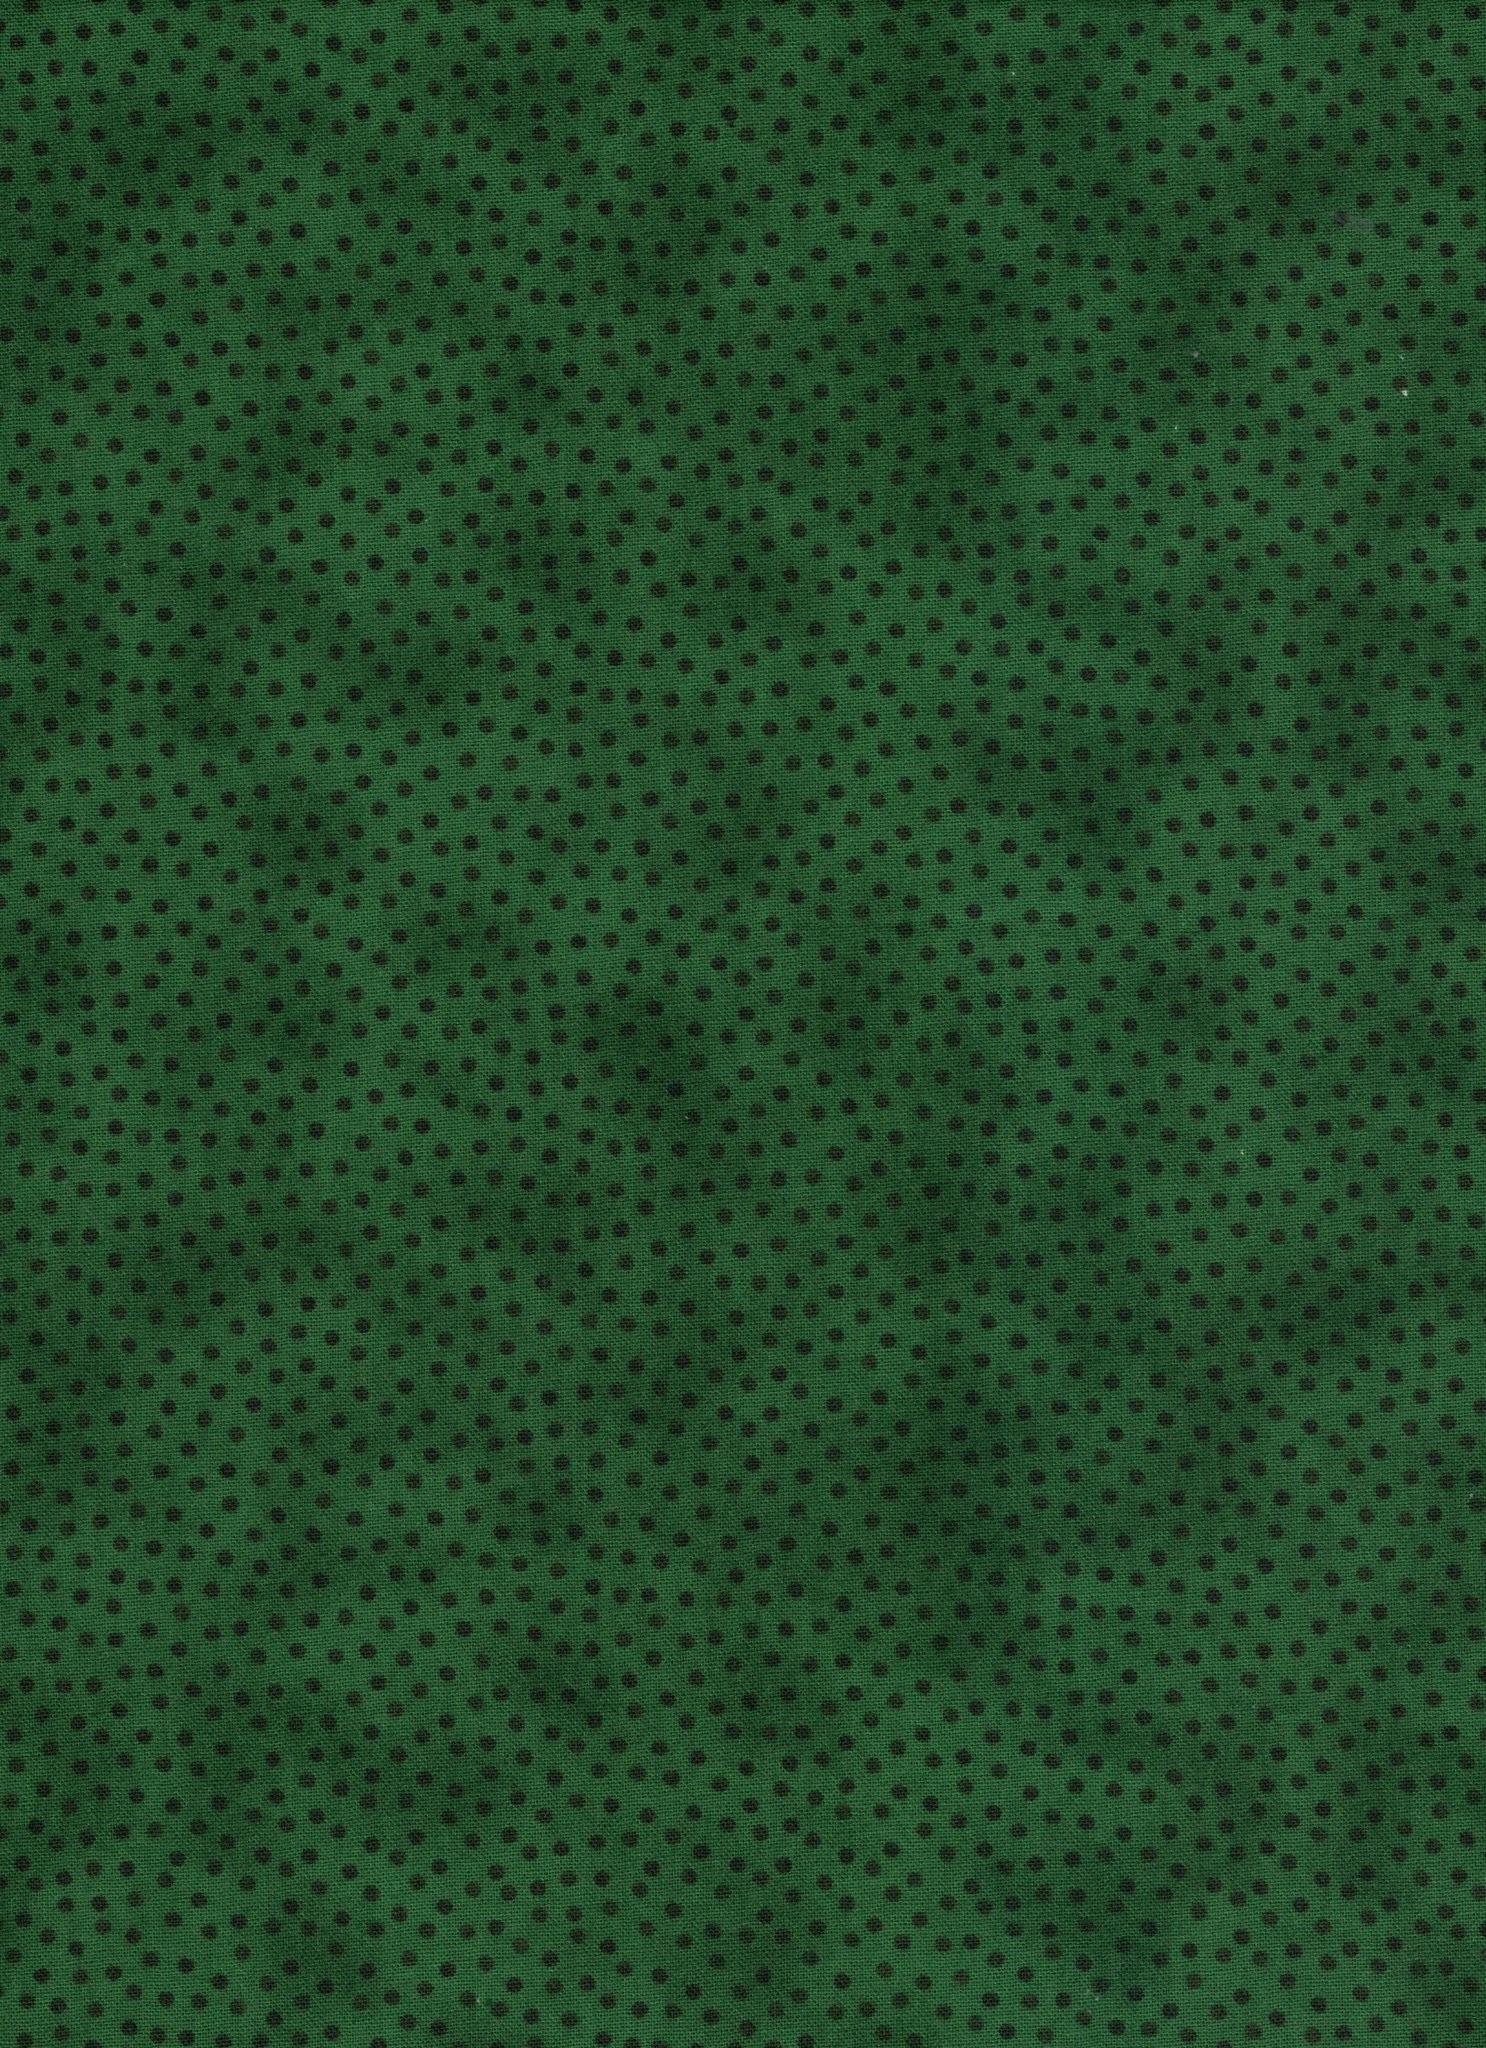 Polka Dot Blender - Green - 1/2m Cut 55767